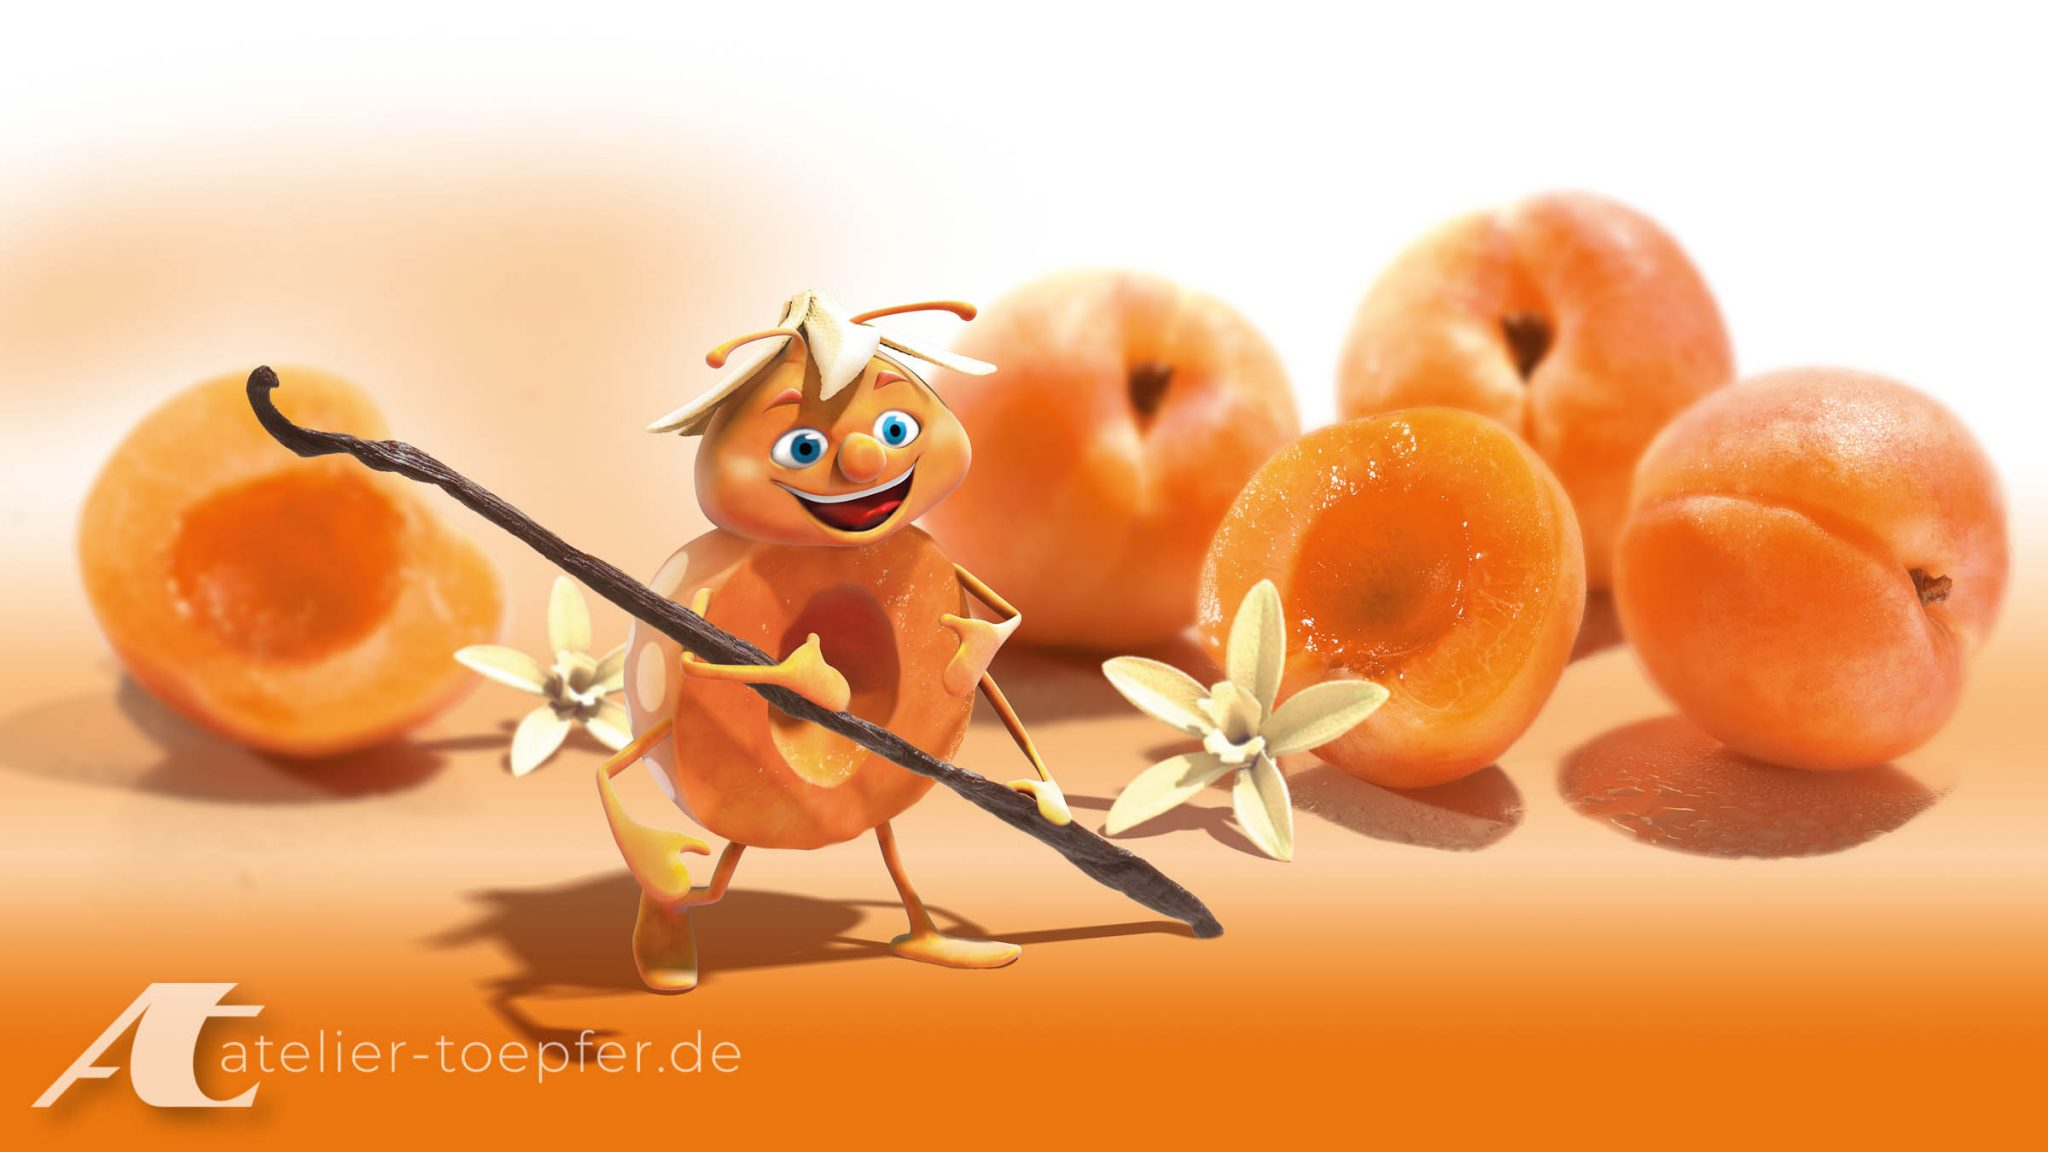 Food-Illustration zum Thema Kindertee aus Marillen